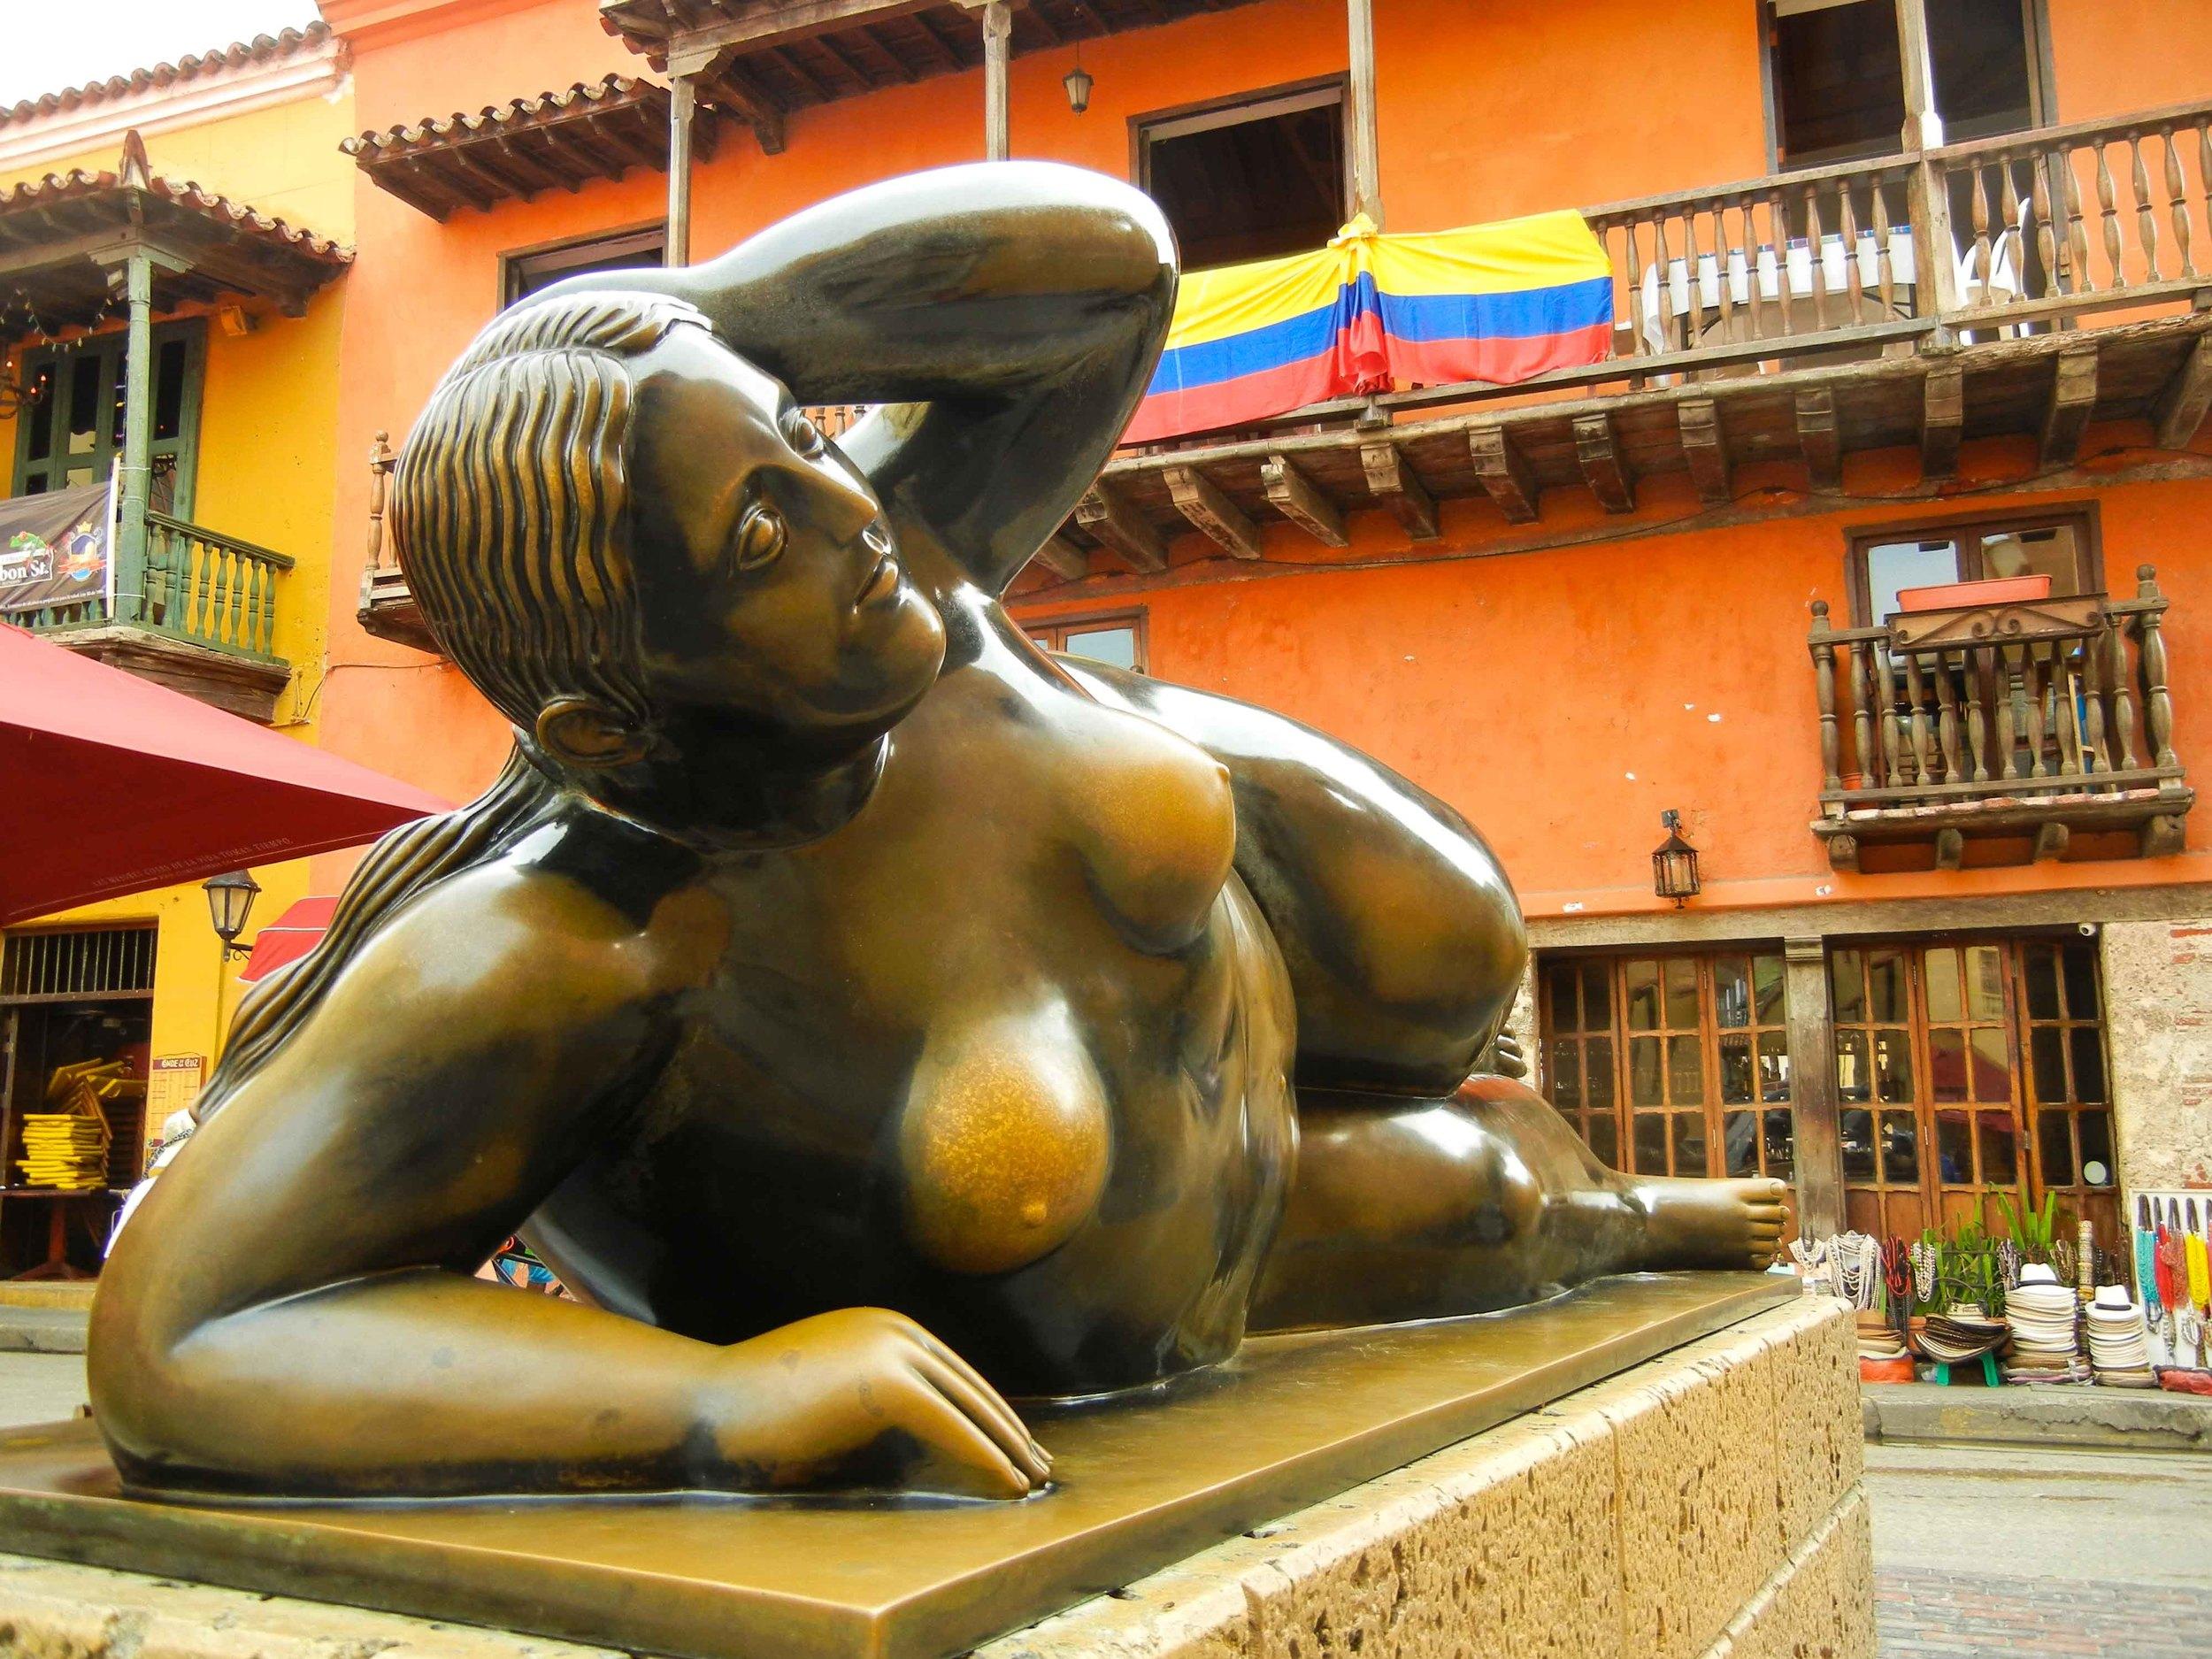 2015_10_Cartagena_s-37.jpg